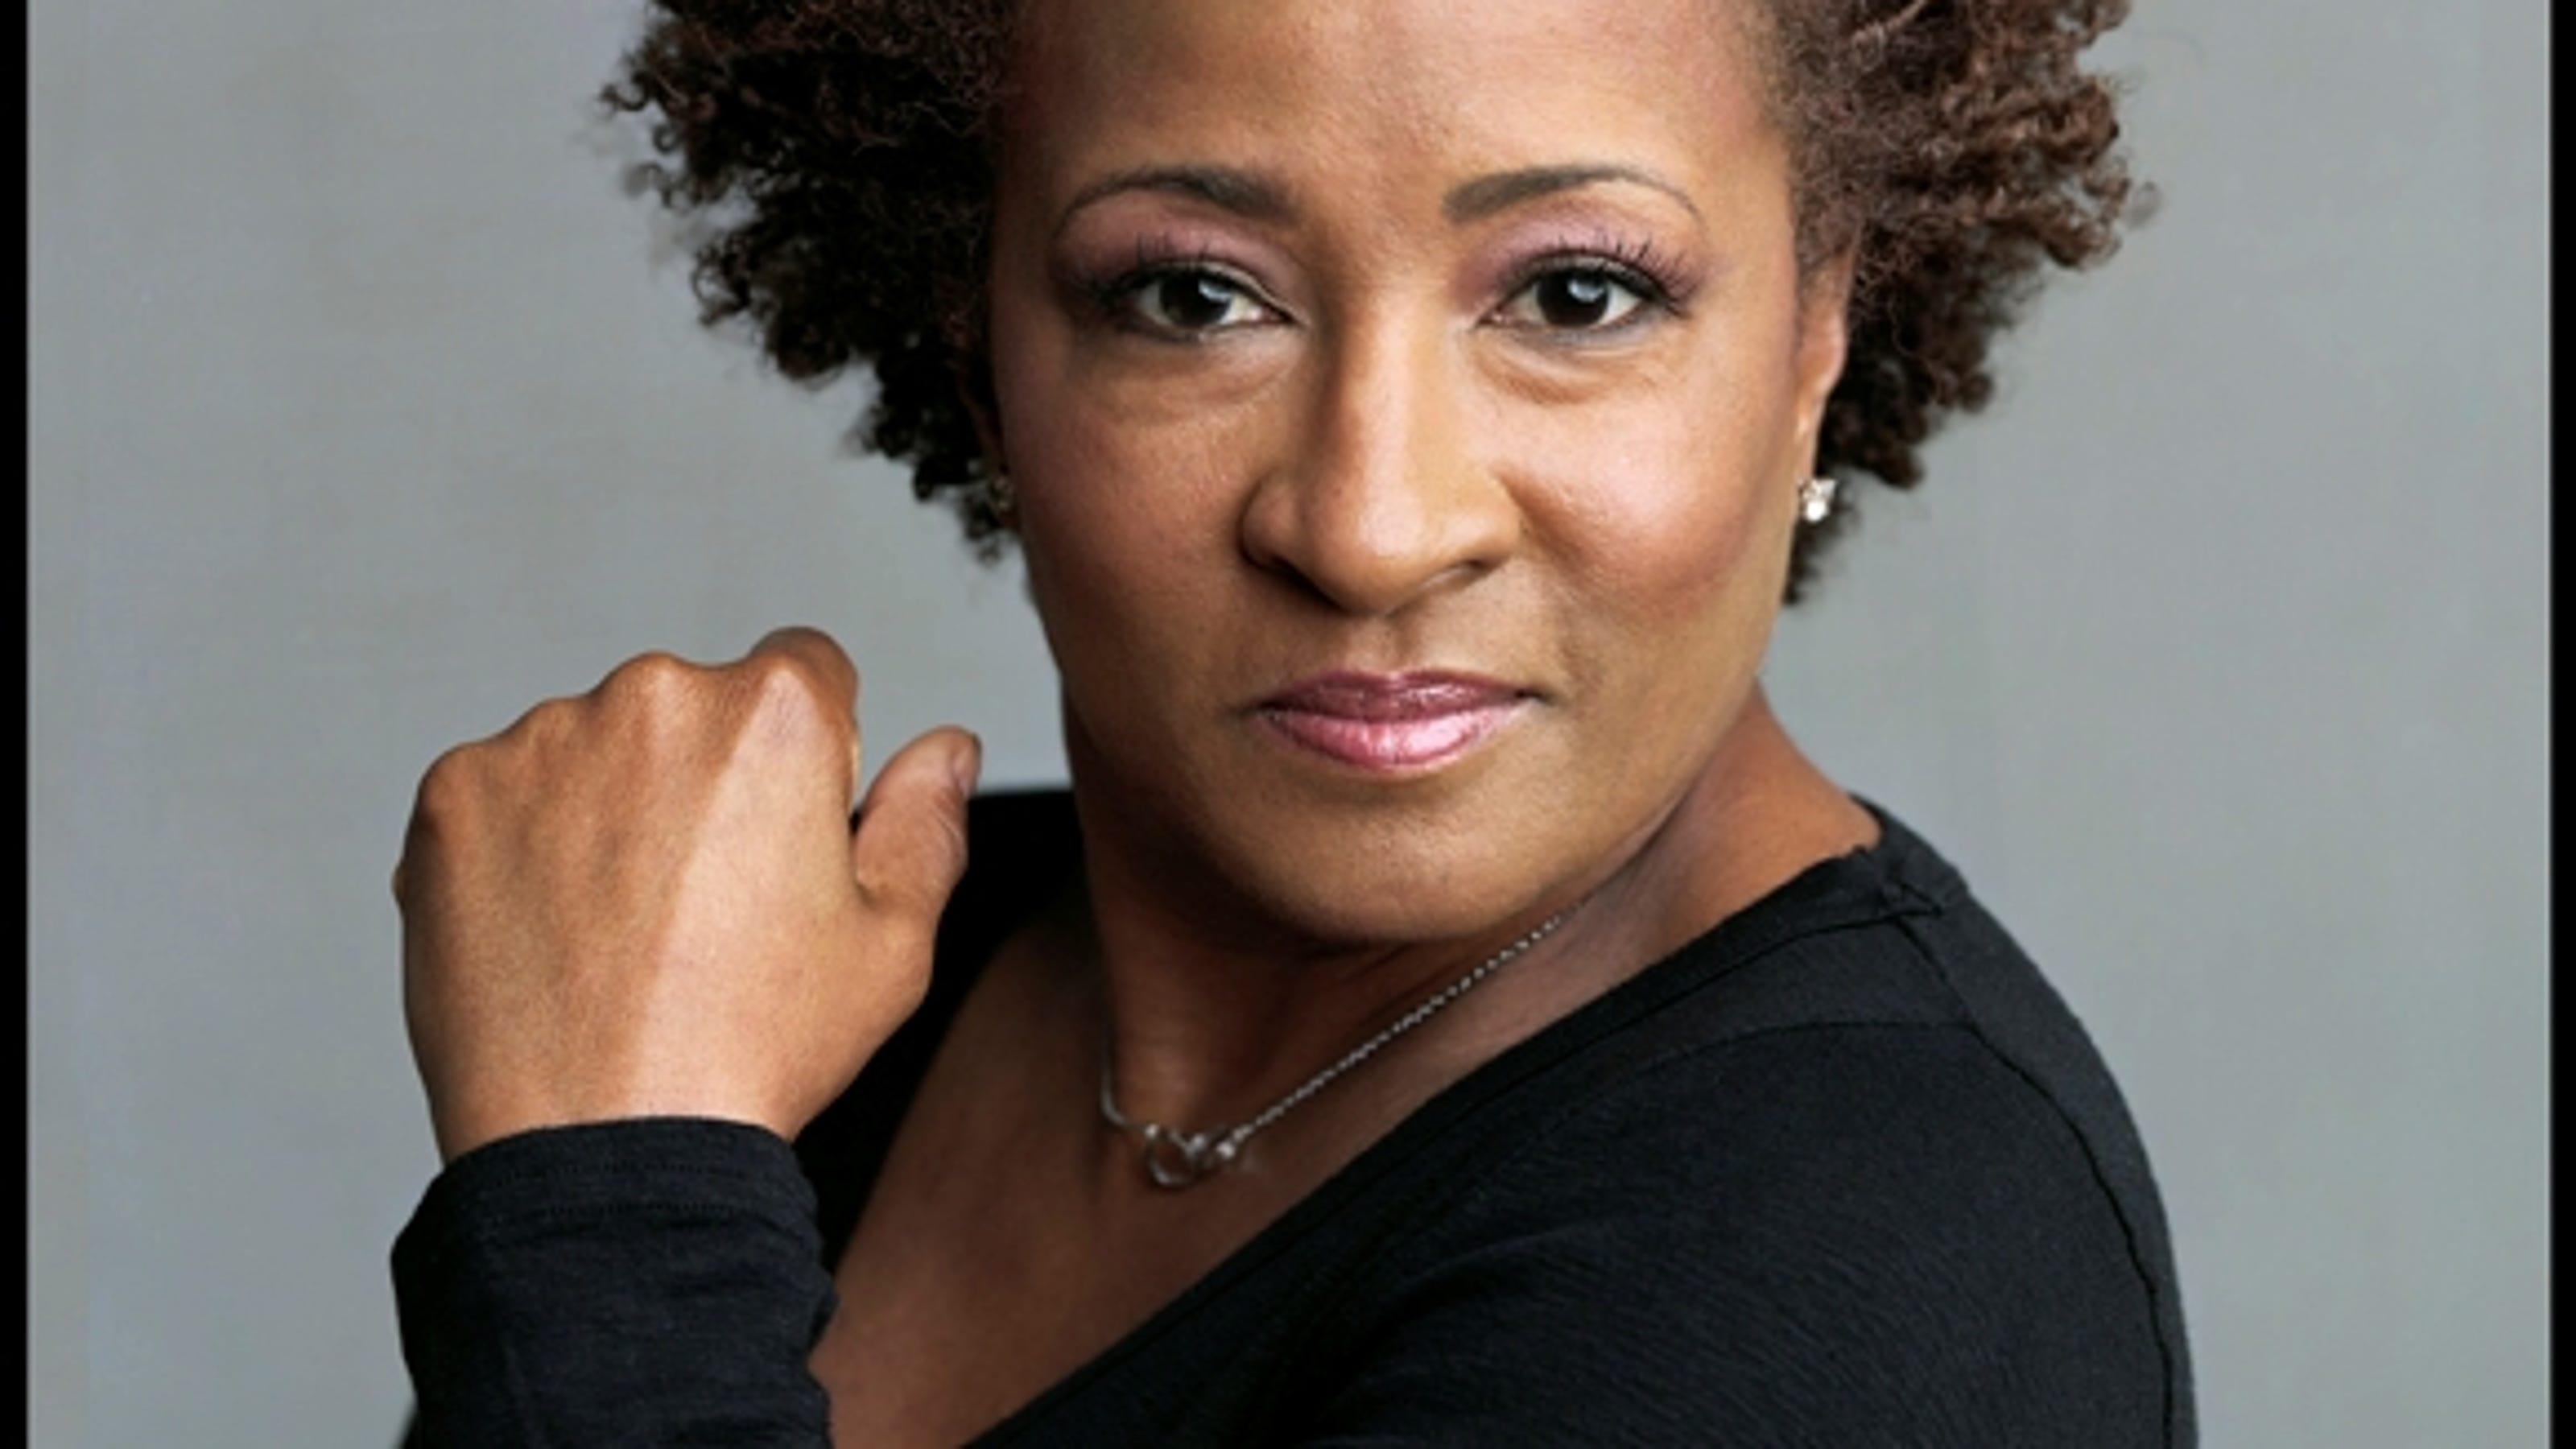 Black american comedian woman lesbian hbo